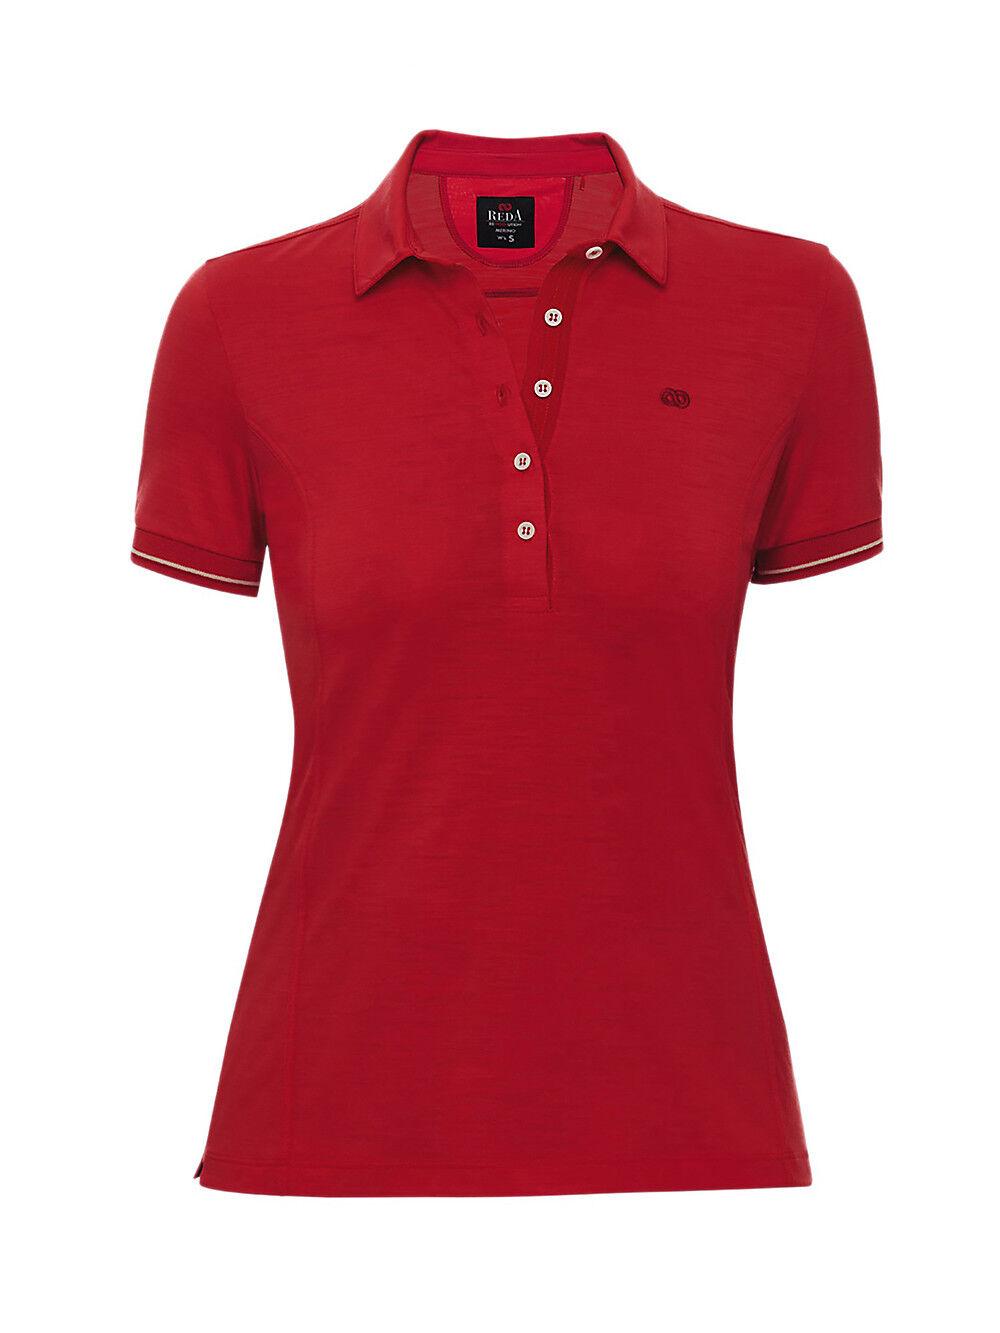 Reda Rewoolution - Egreen Women's Polo Shirt - 140 G M ² Merino-Jersey